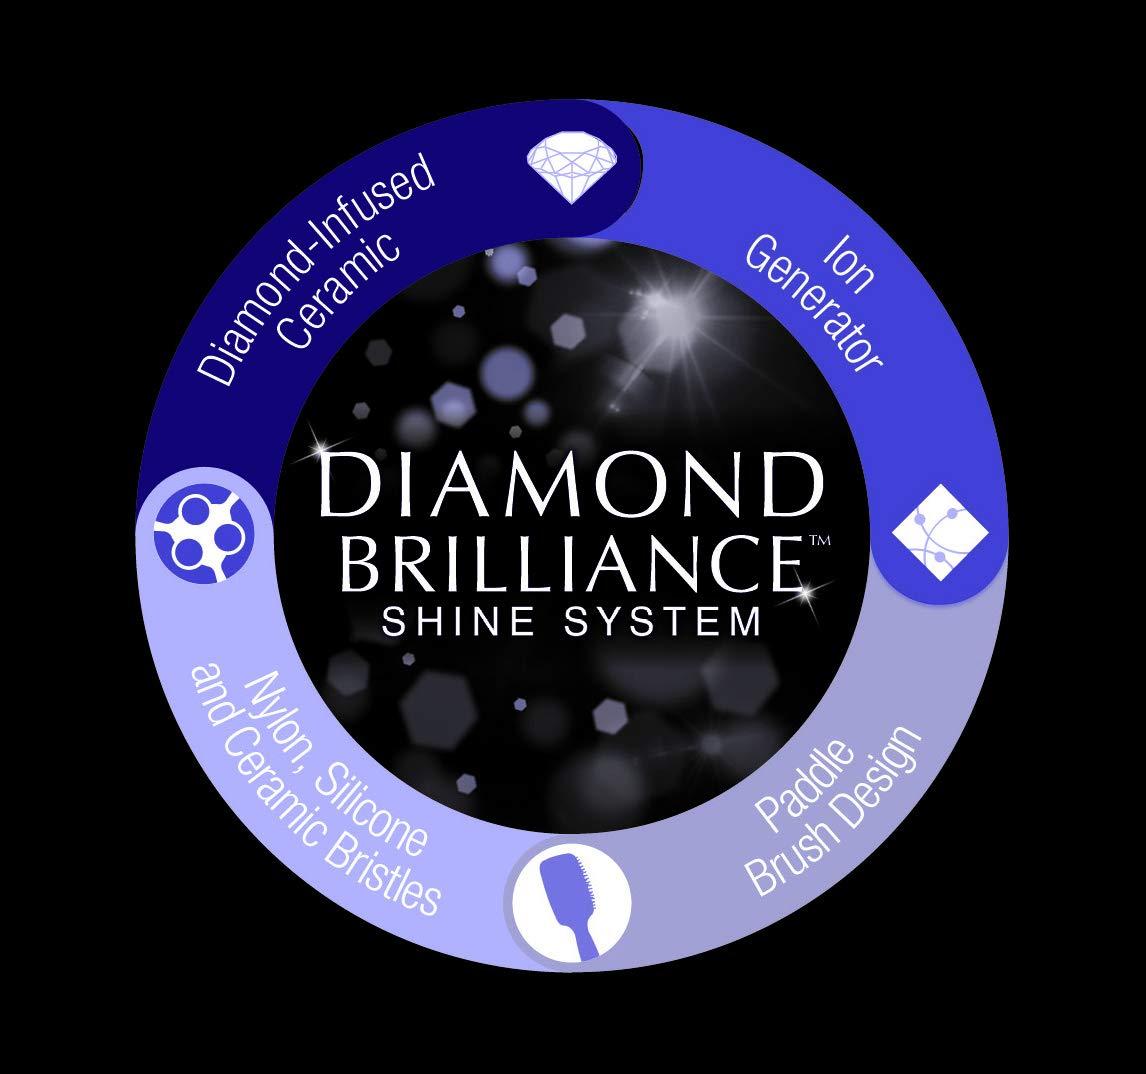 INFINITIPRO BY CONAIR Diamond-Infused Ceramic Smoothing Hot Brush/Straightening Brush; Black by Conair (Image #4)